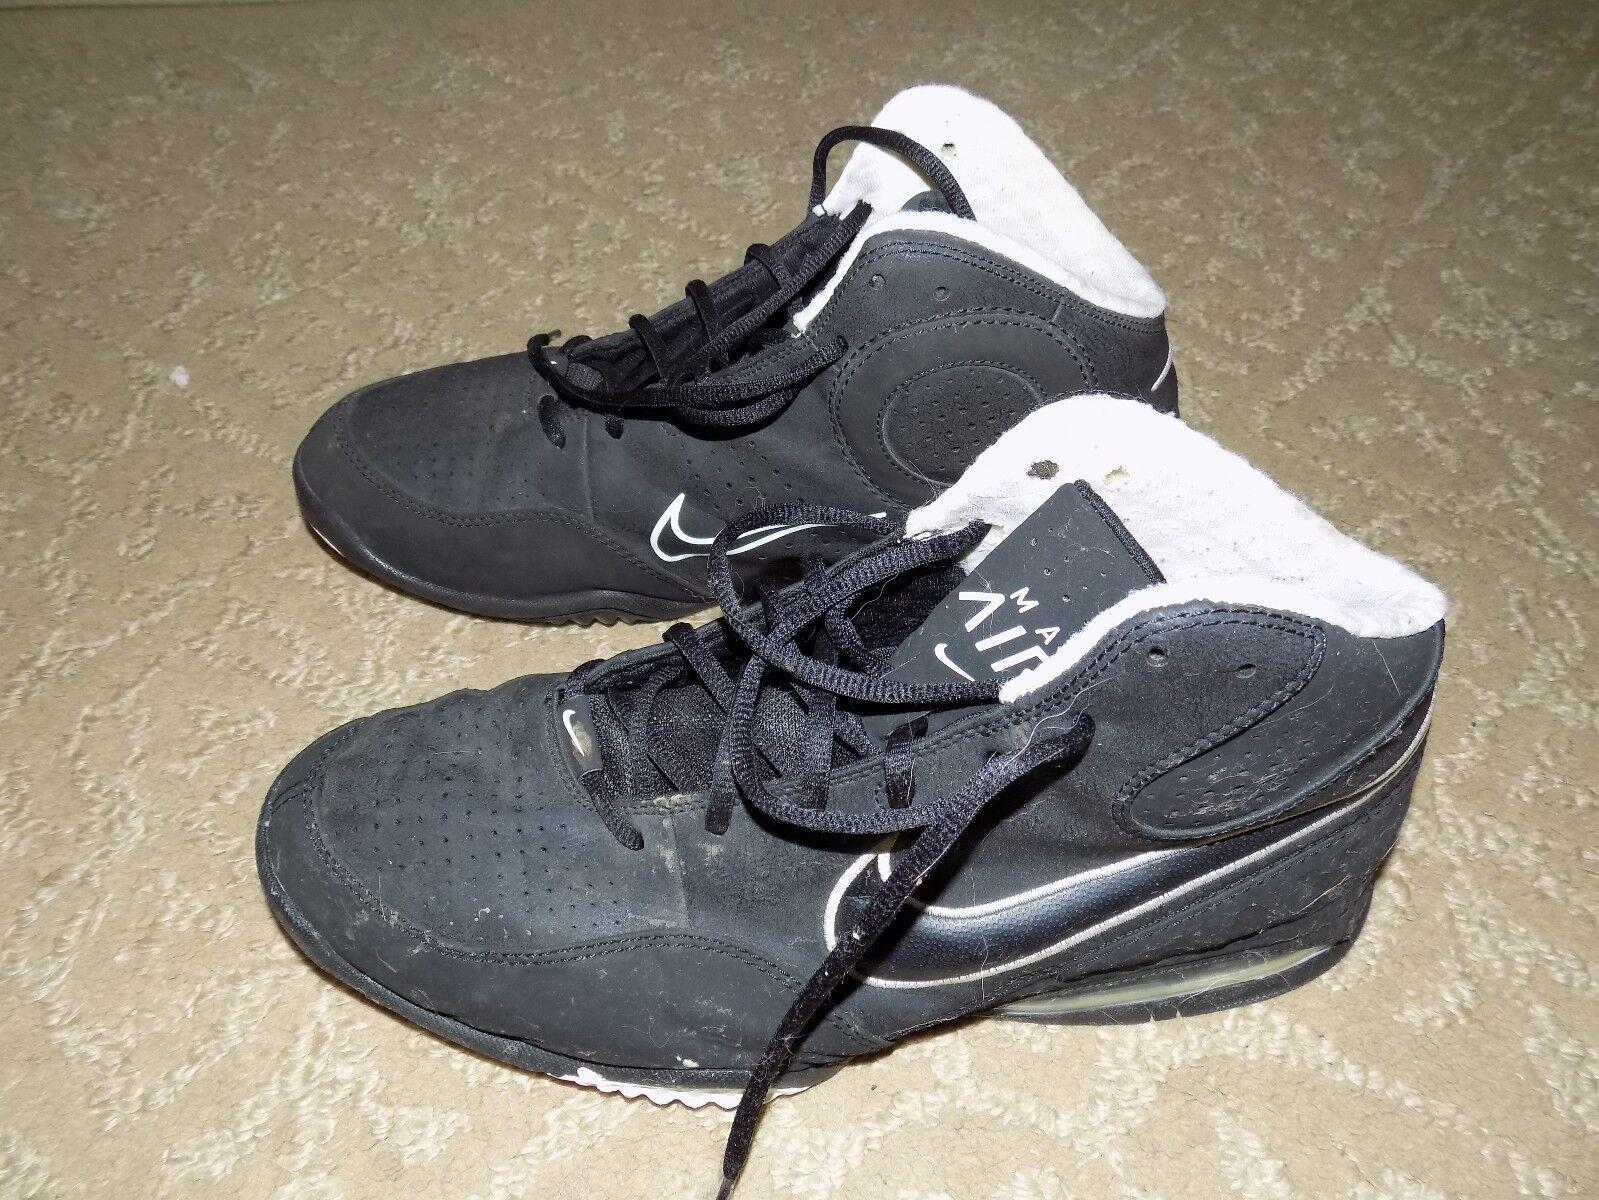 Nike MAX Air Black 345000-004Size 11.5 USA Men's EUC FREE USA 11.5 SHIPPING 502183